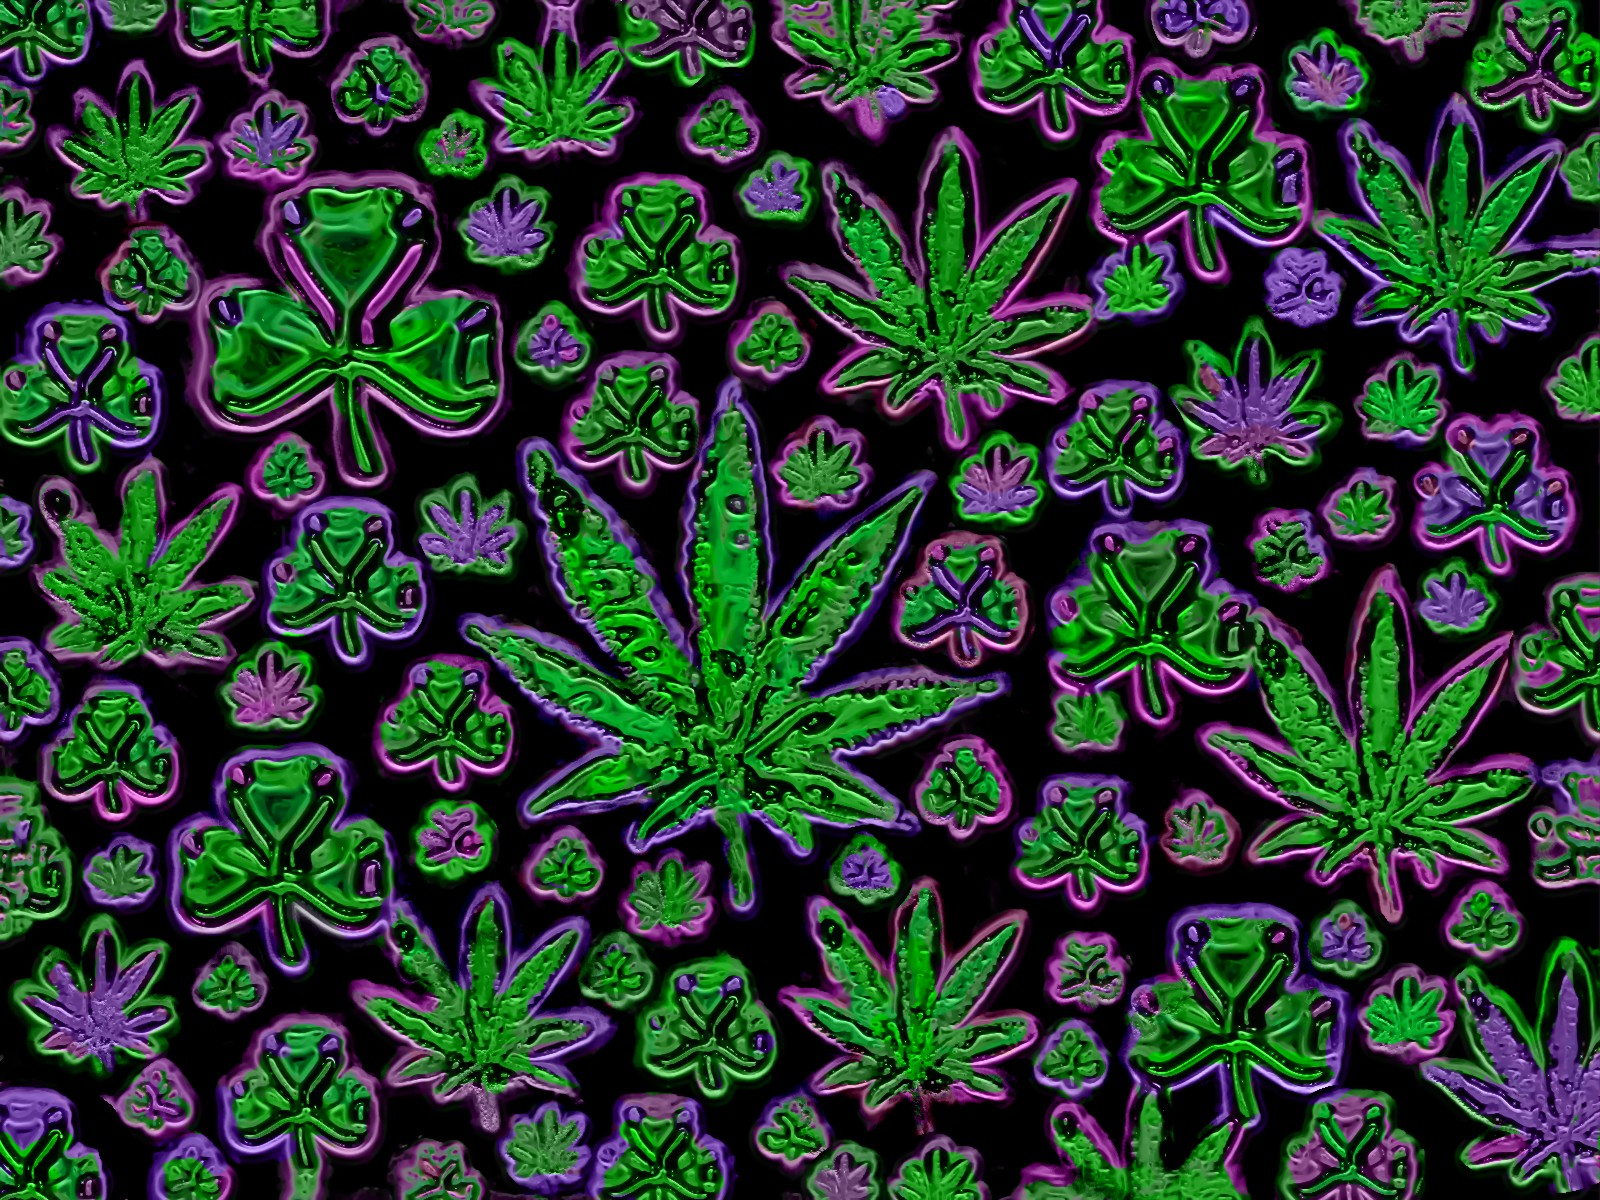 pot leaf wallpapers hd wallpapersafari marijuana leaf transparent background Cool Marijuana Background